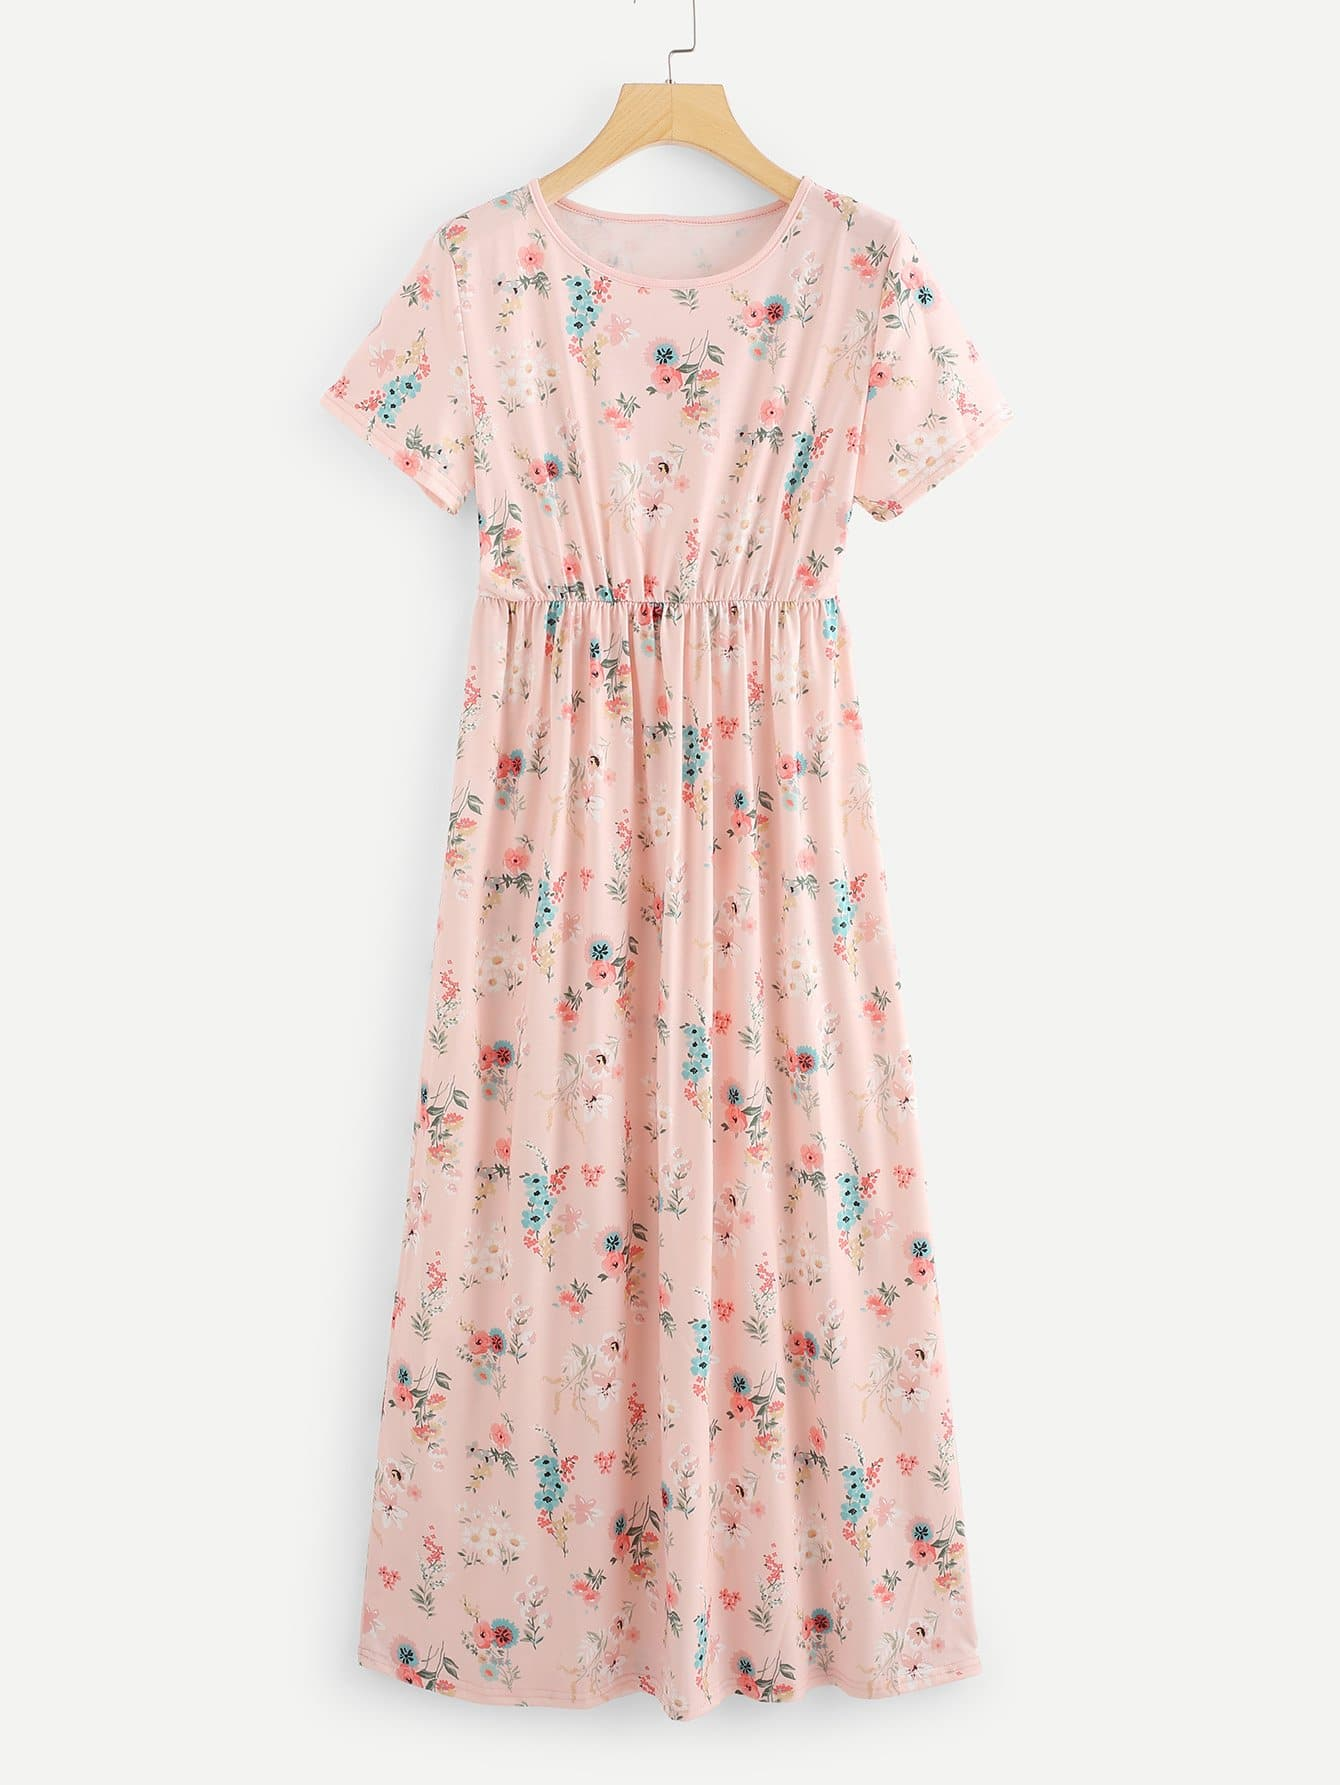 Calico Print Dress calico print tights